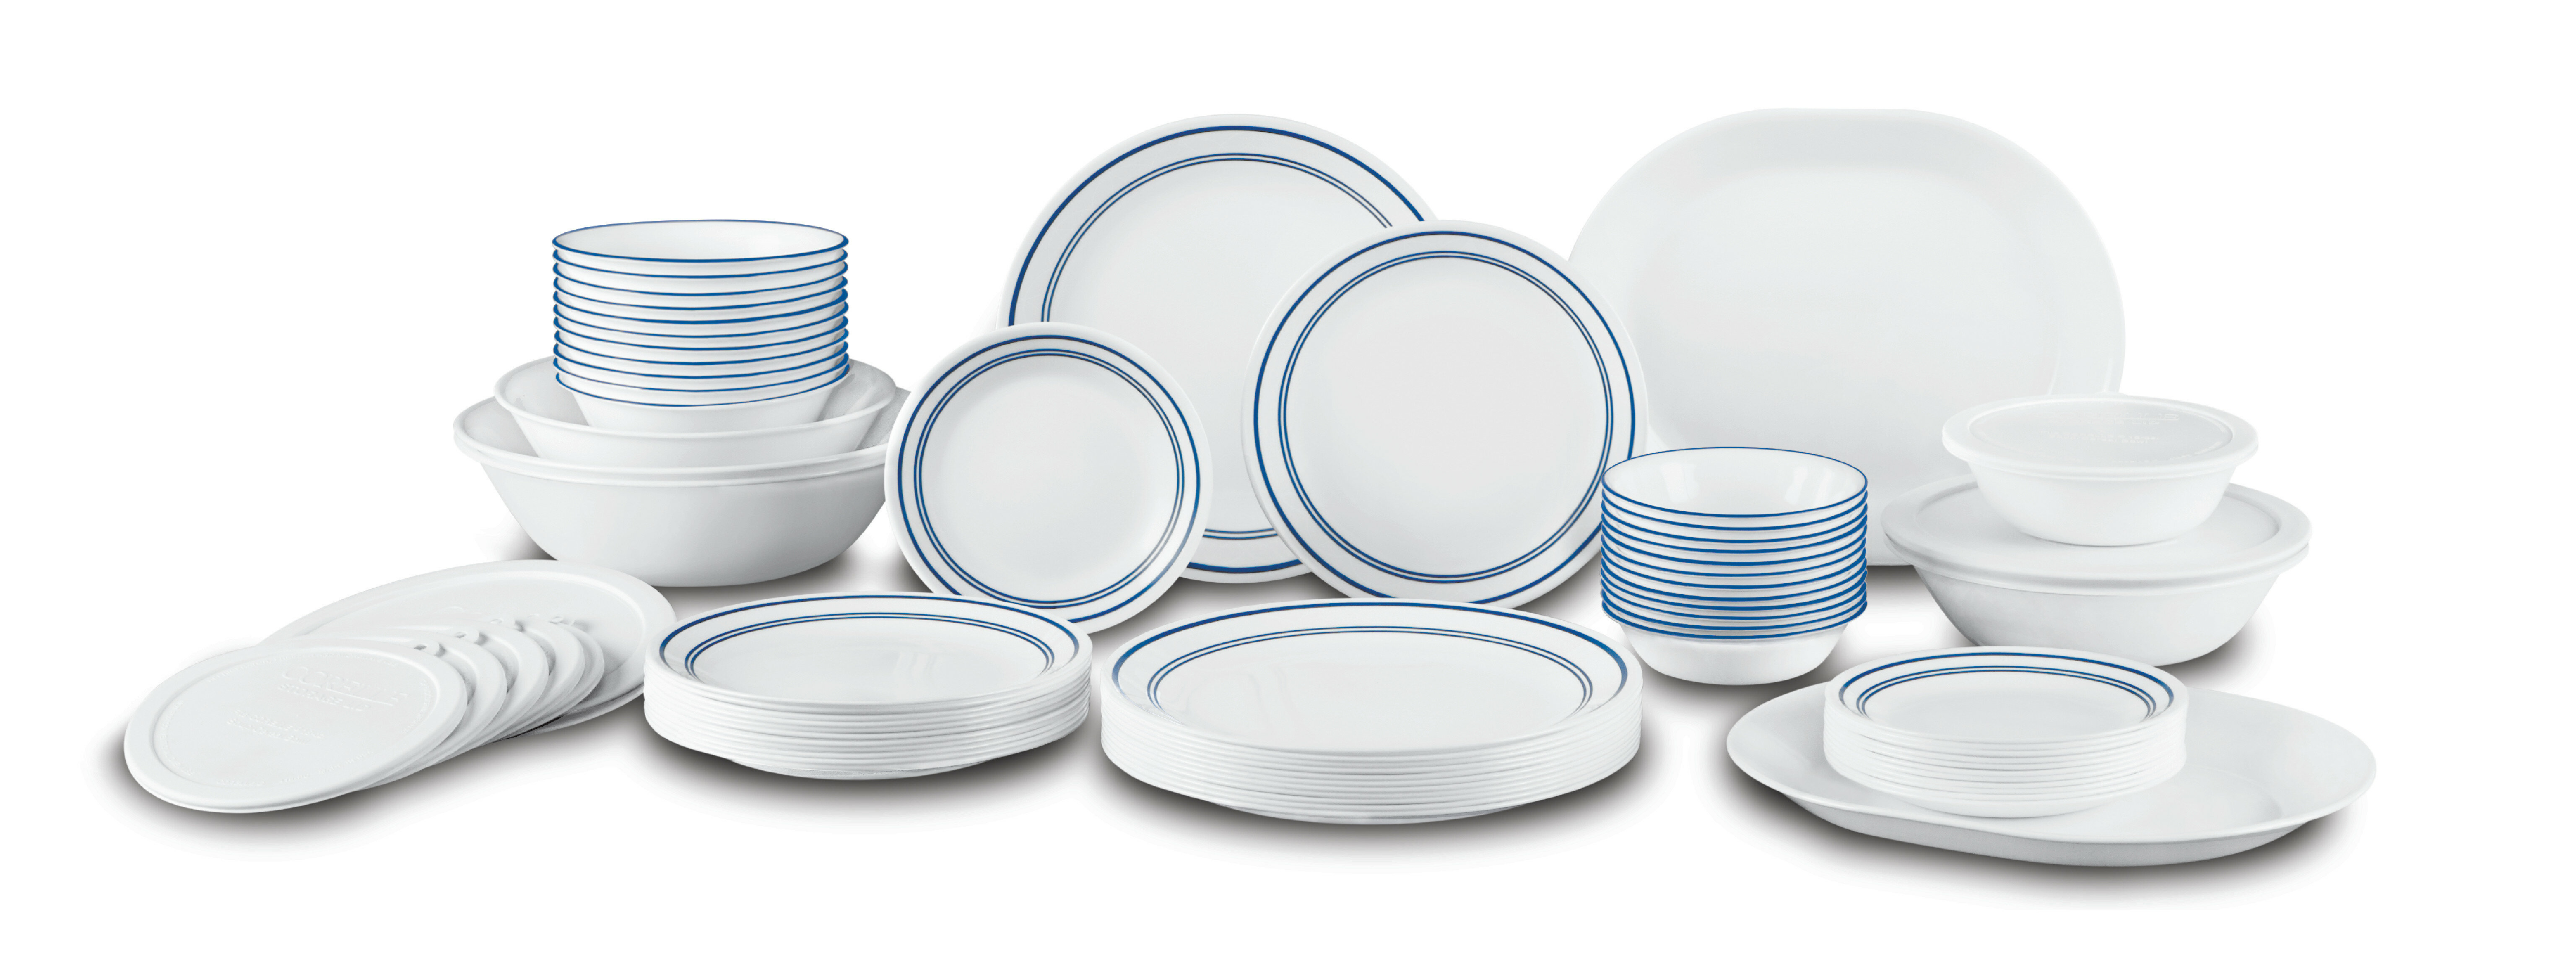 Corelle Classic Cafe Living Ware 74 Piece Dinnerware Set Service for 12 \u0026 Reviews | Wayfair  sc 1 st  Wayfair & Corelle Classic Cafe Living Ware 74 Piece Dinnerware Set Service ...